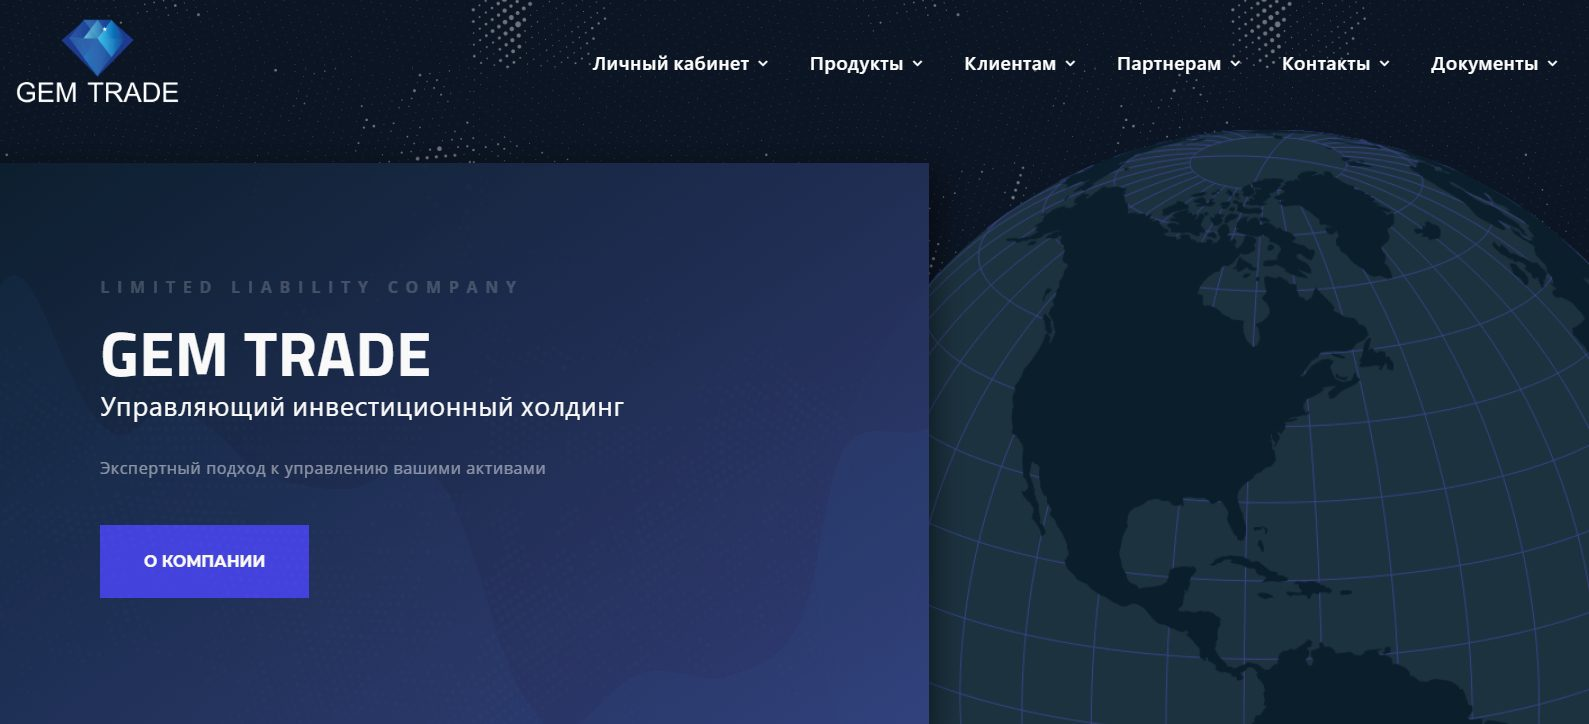 Сайт проекта Gem Trade